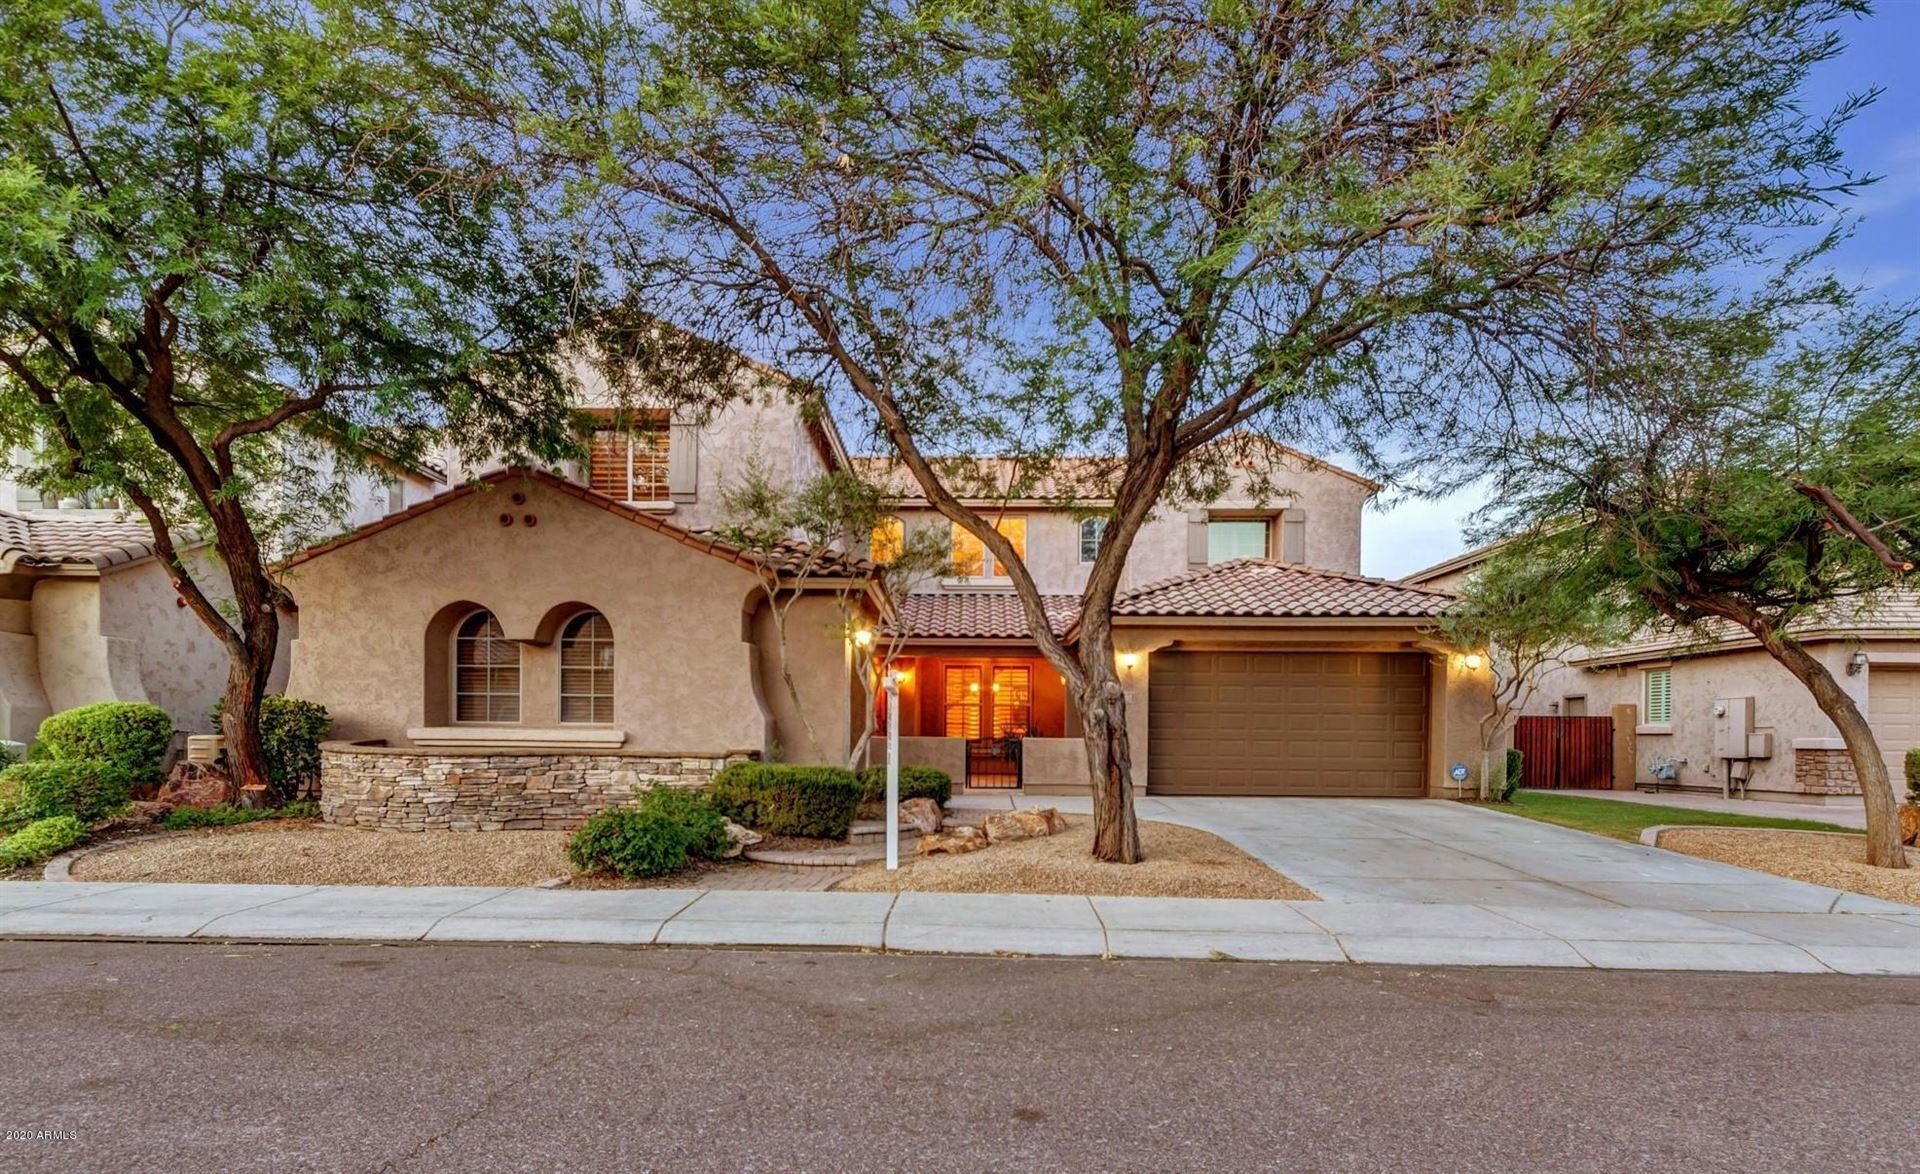 5605 W ANDREA Drive, Phoenix, AZ 85083 - #: 6095620